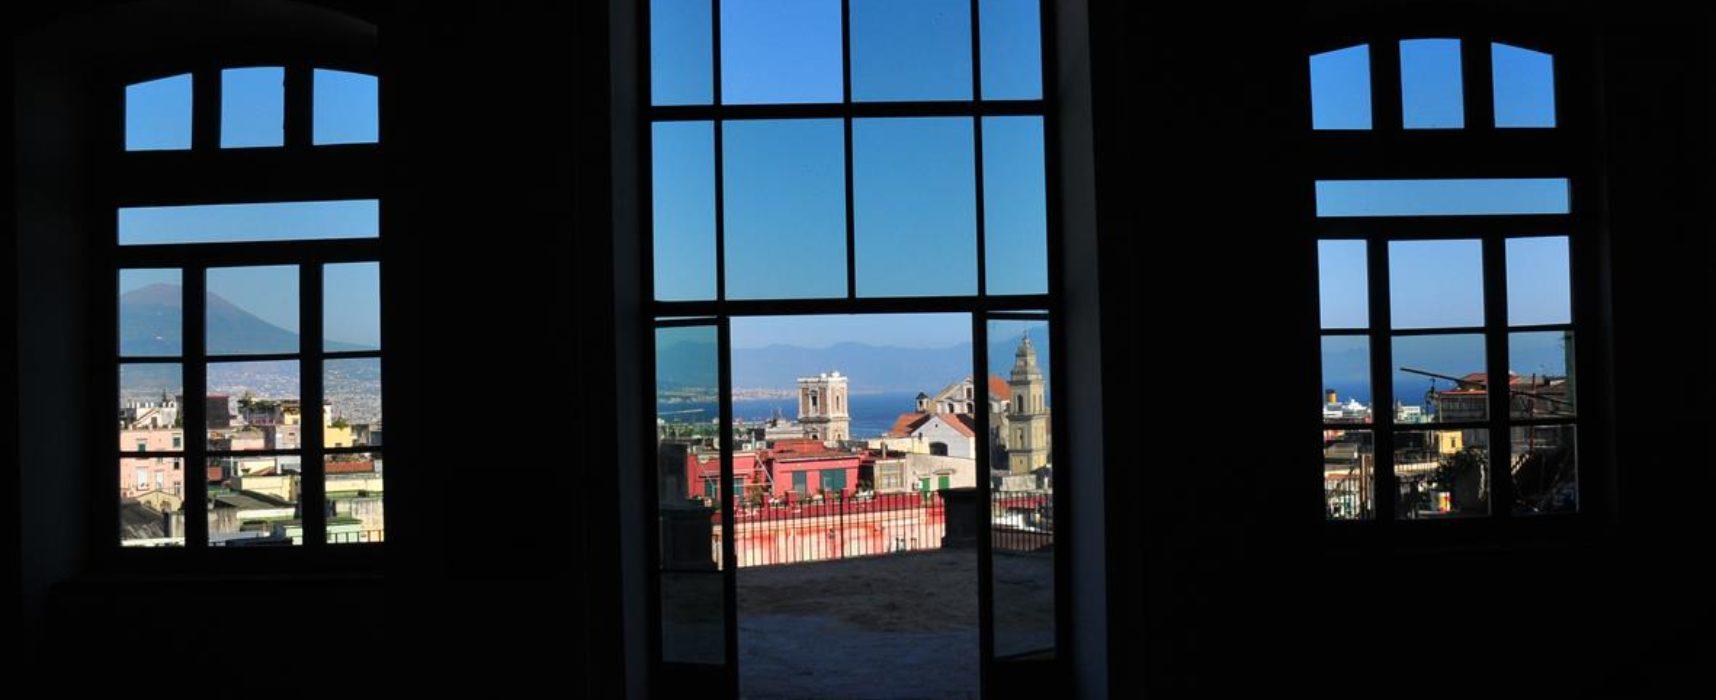 Palazzo Ayerbo D'Aragona Cassano diventa Casa Morra